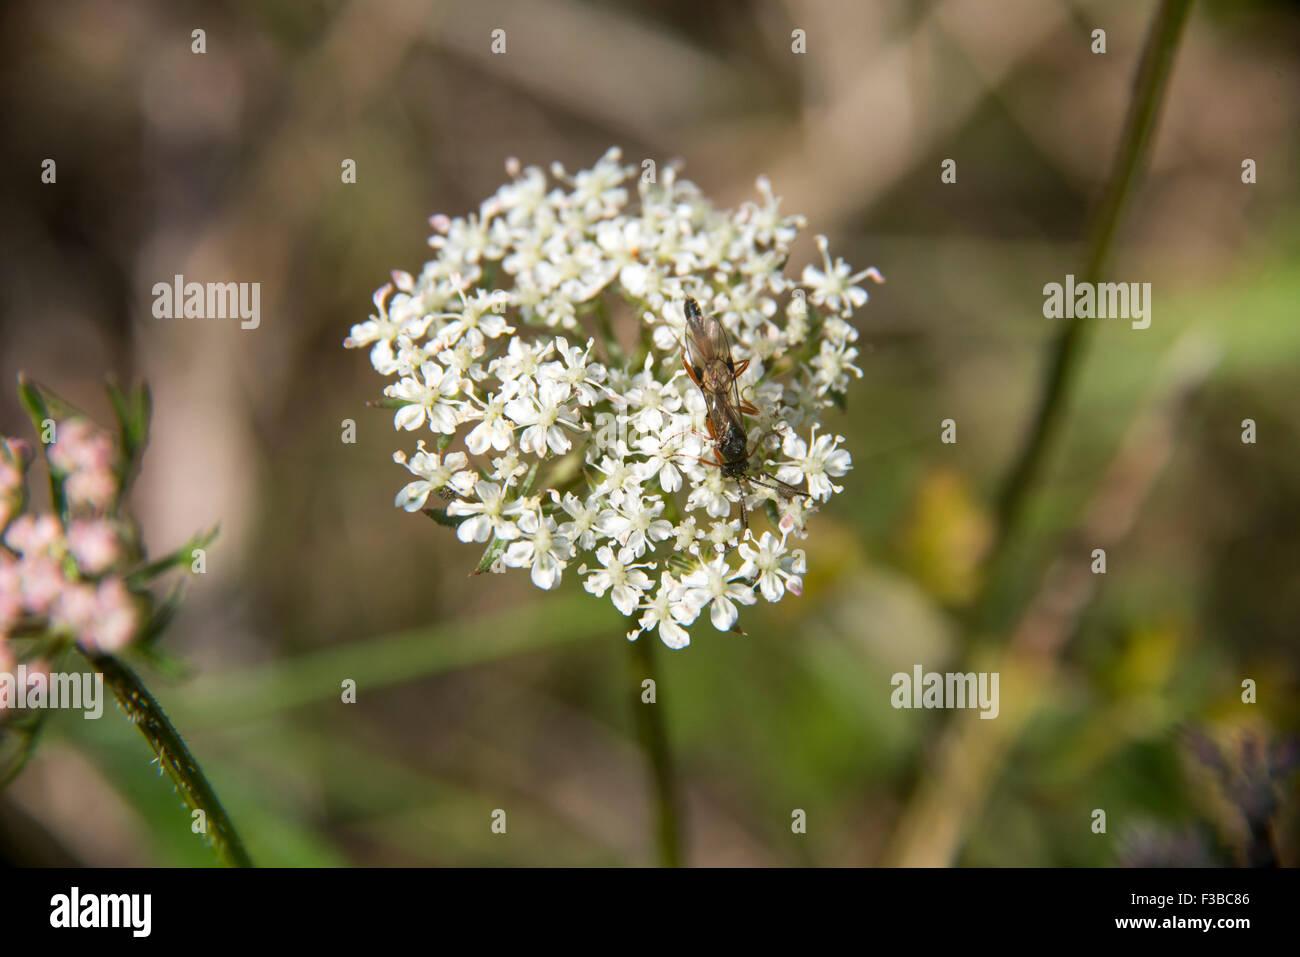 Hedgerow weeds stock photos hedgerow weeds stock images alamy white flower with bug stock image mightylinksfo